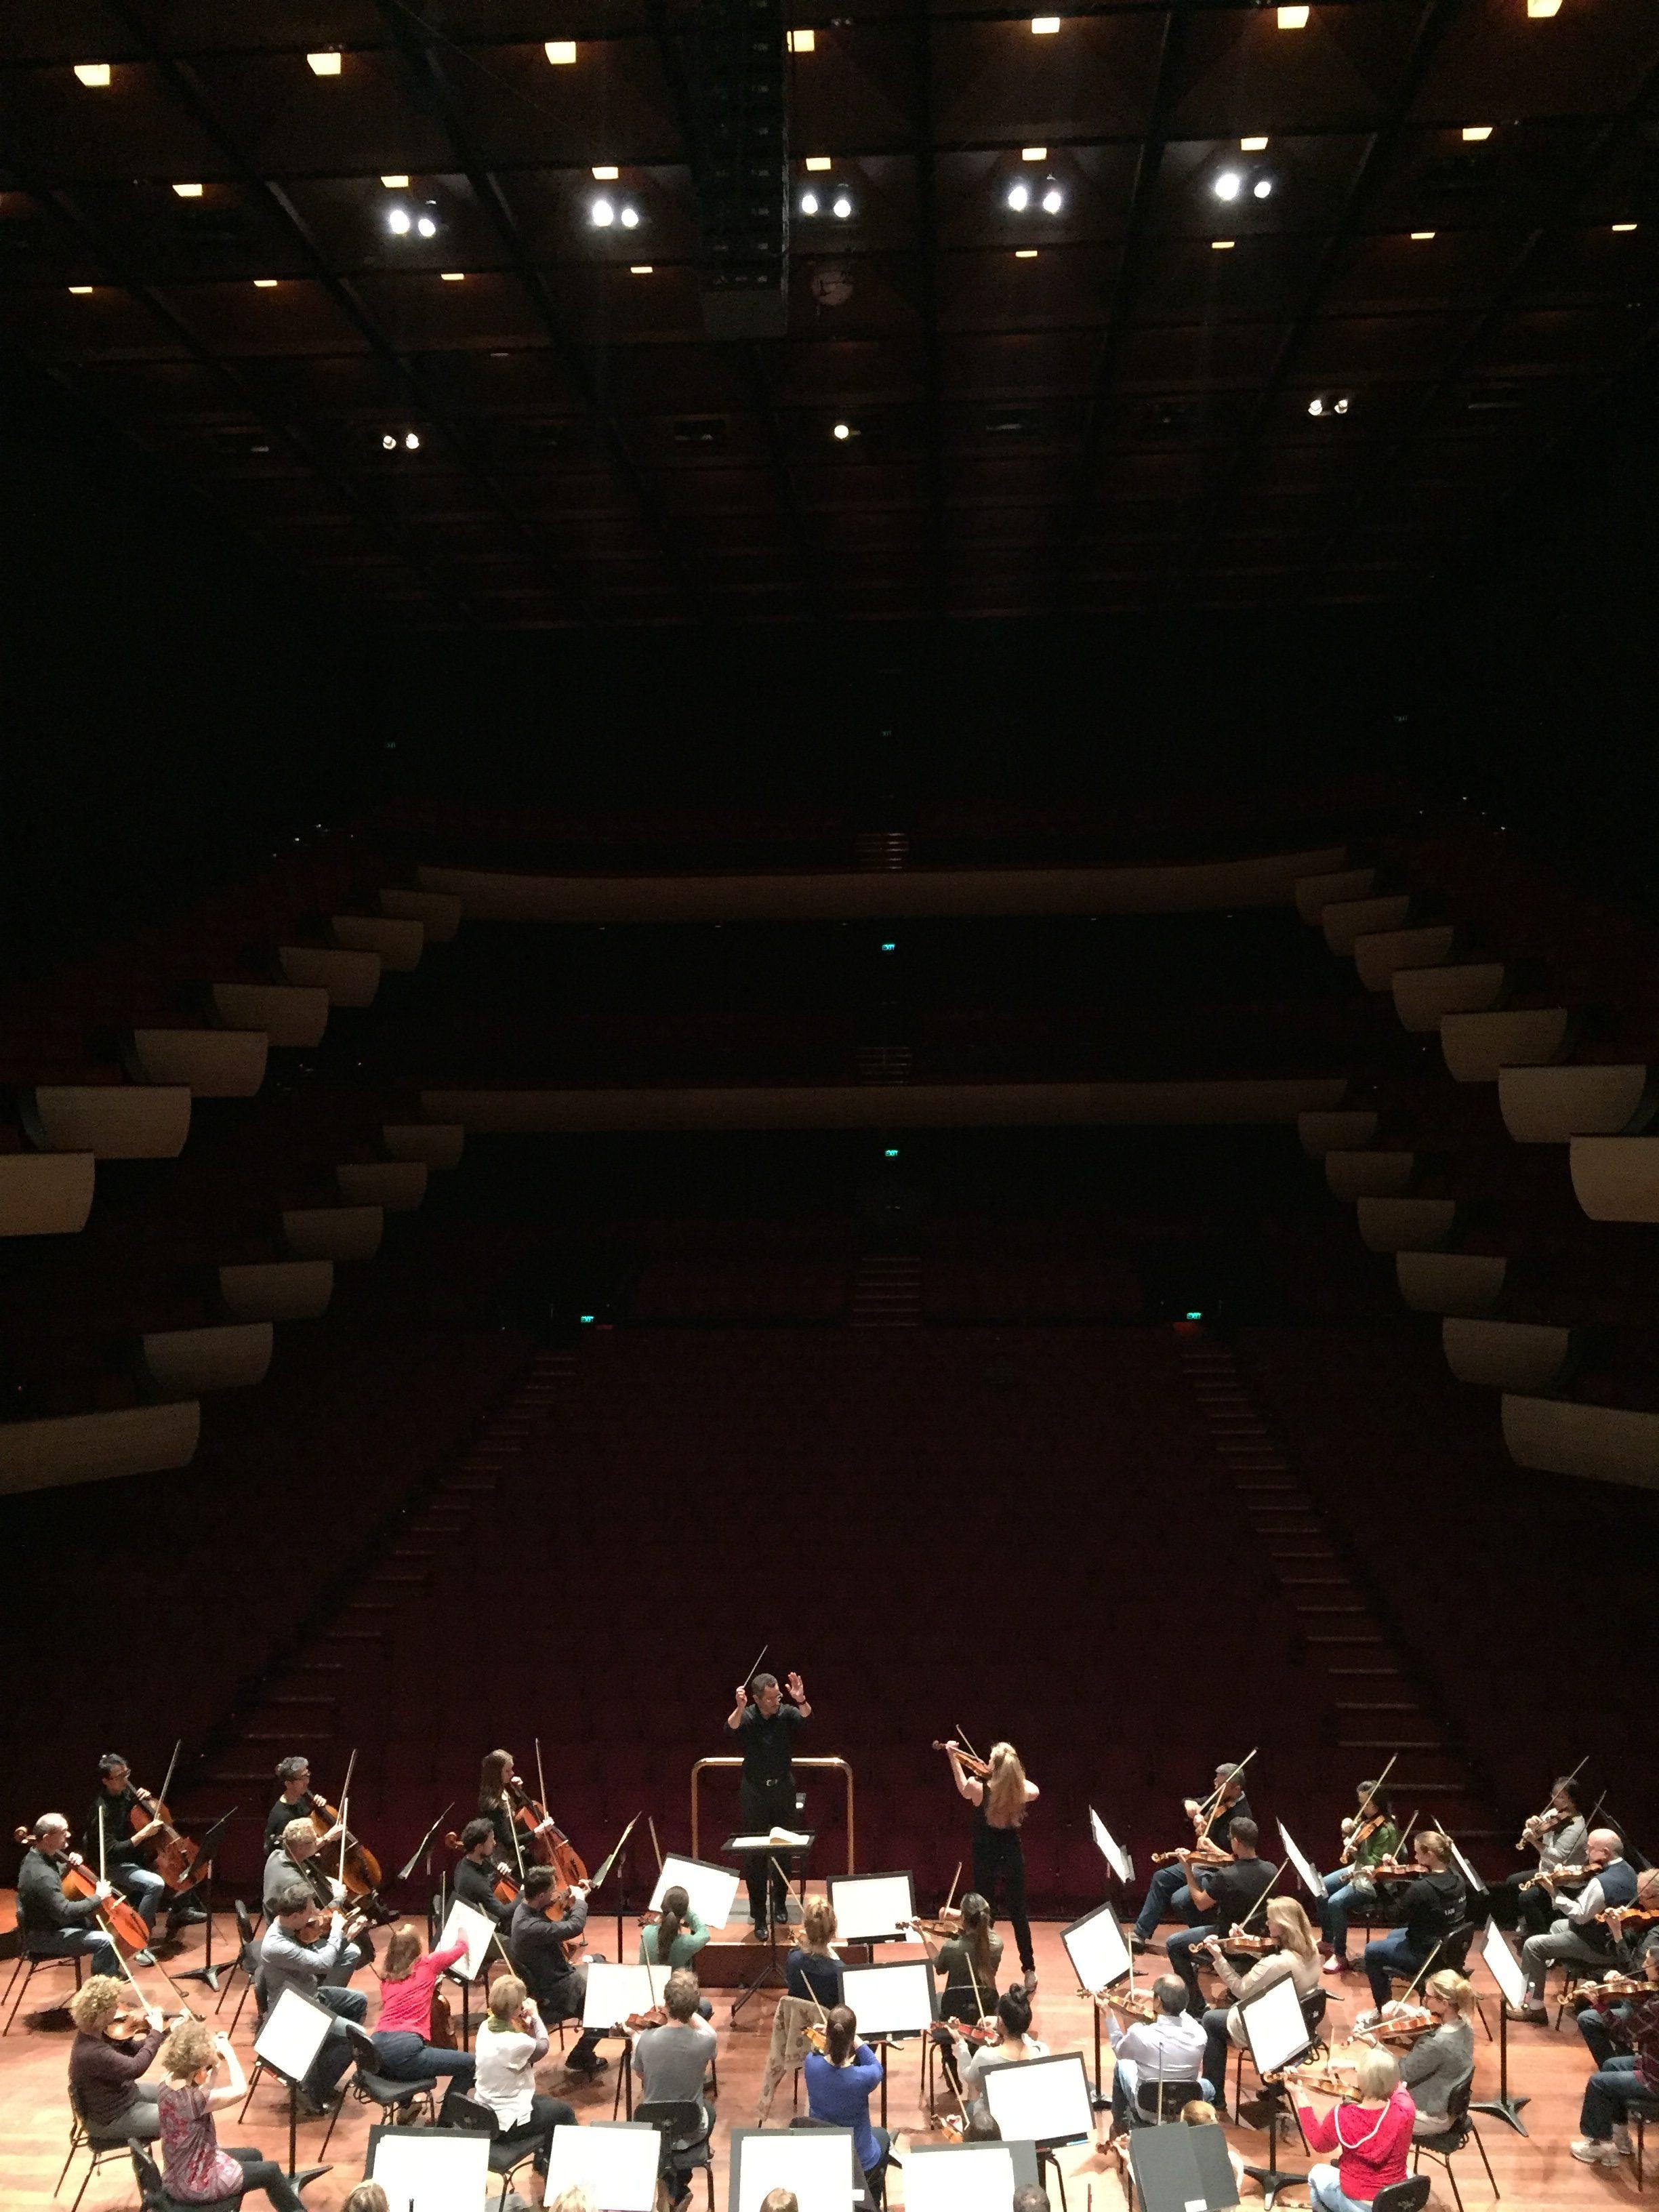 2016 - Australia, Perth West Australian Symphony, Andrew Grams